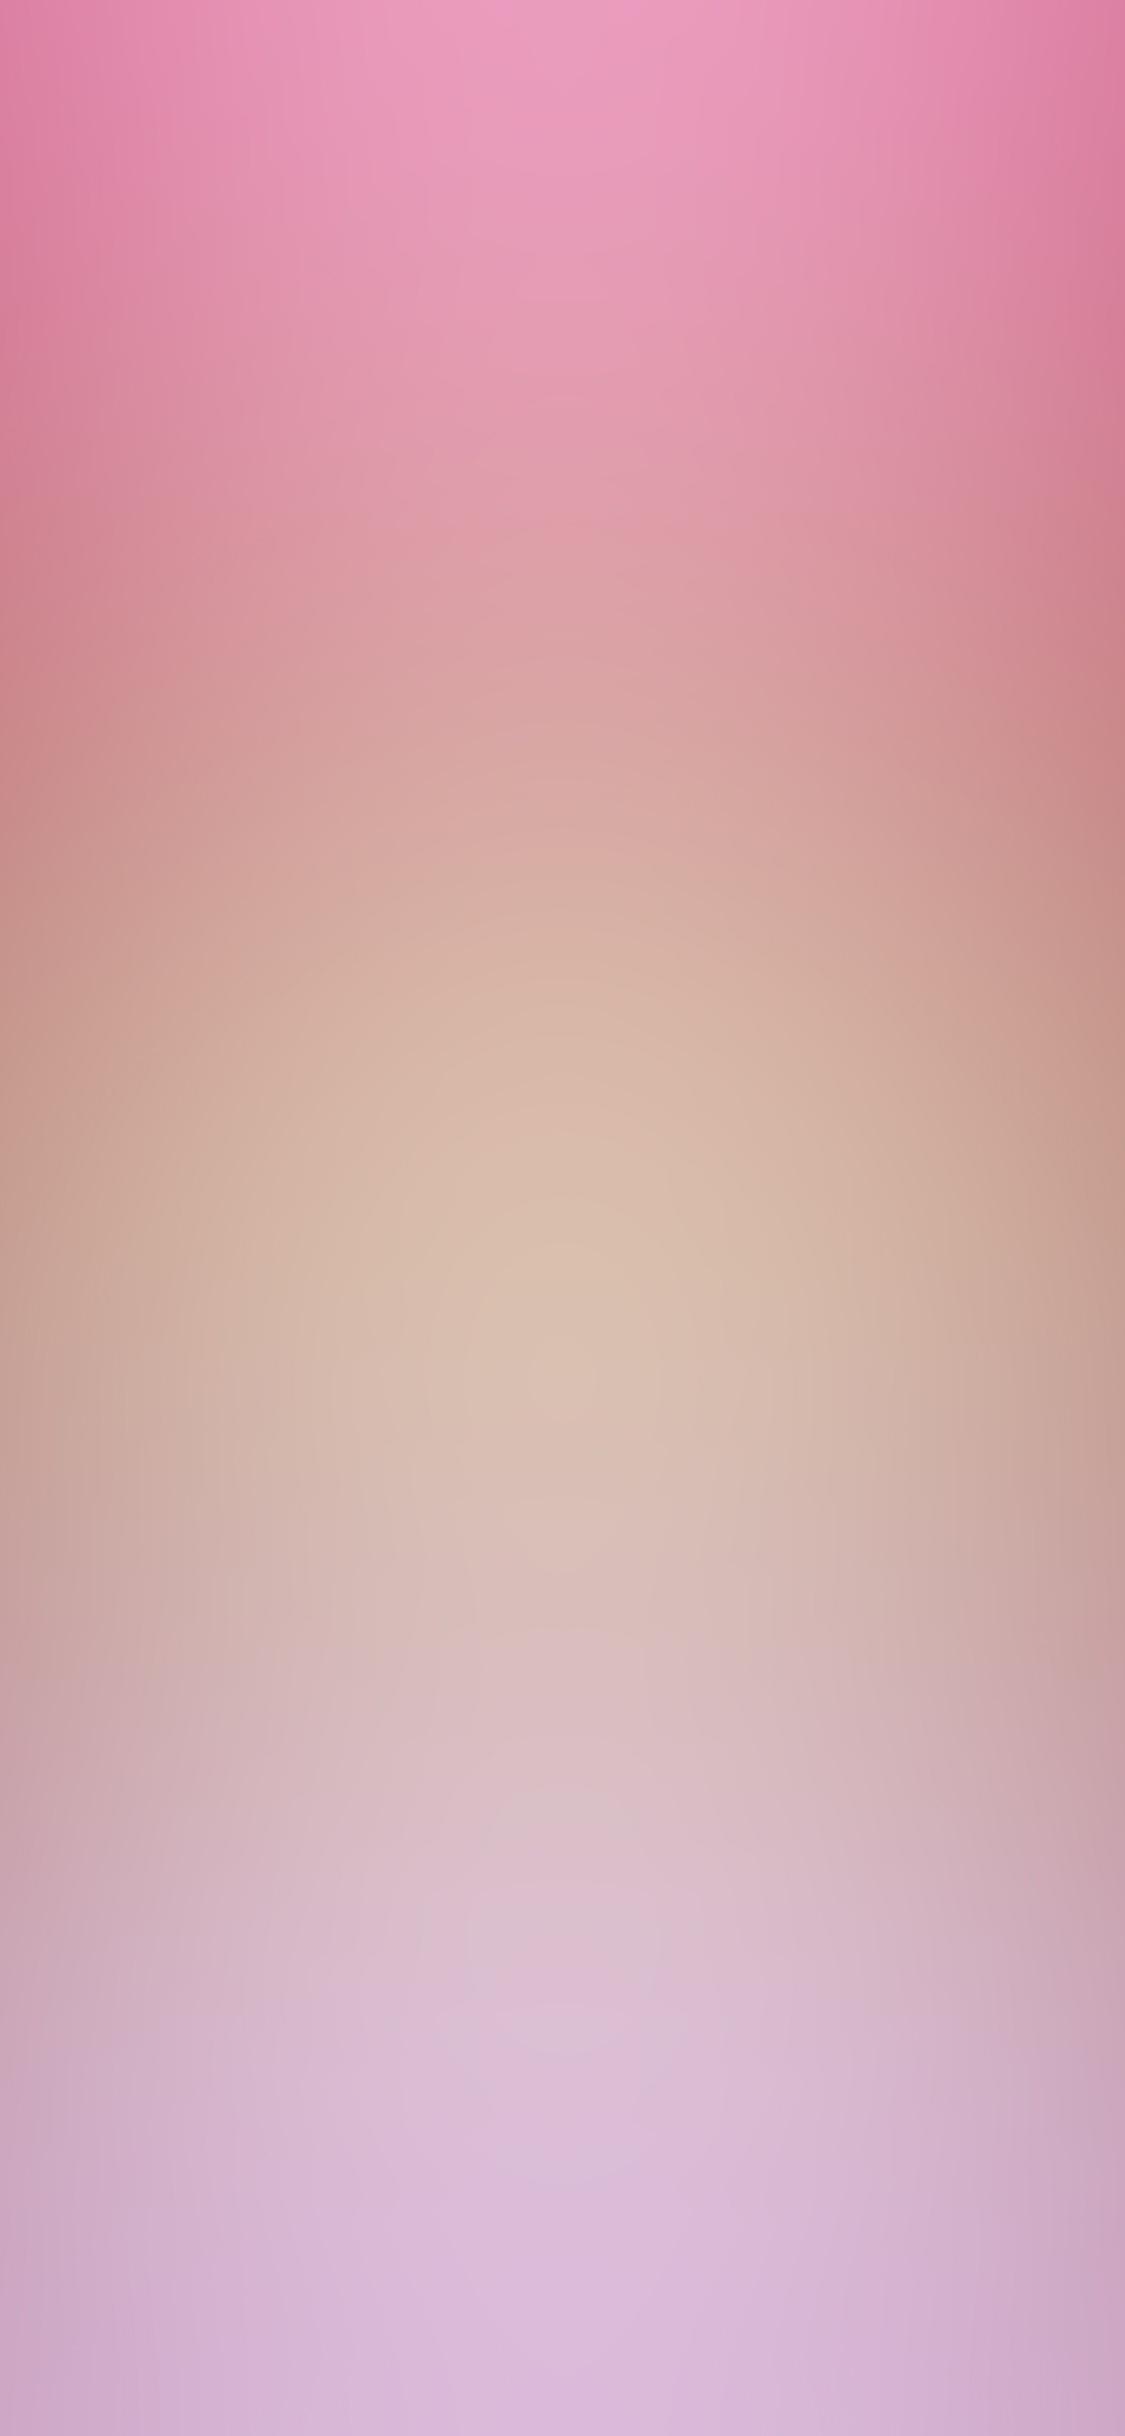 iPhoneXpapers.com-Apple-iPhone-wallpaper-sj08-red-sky-soft-pastel-blur